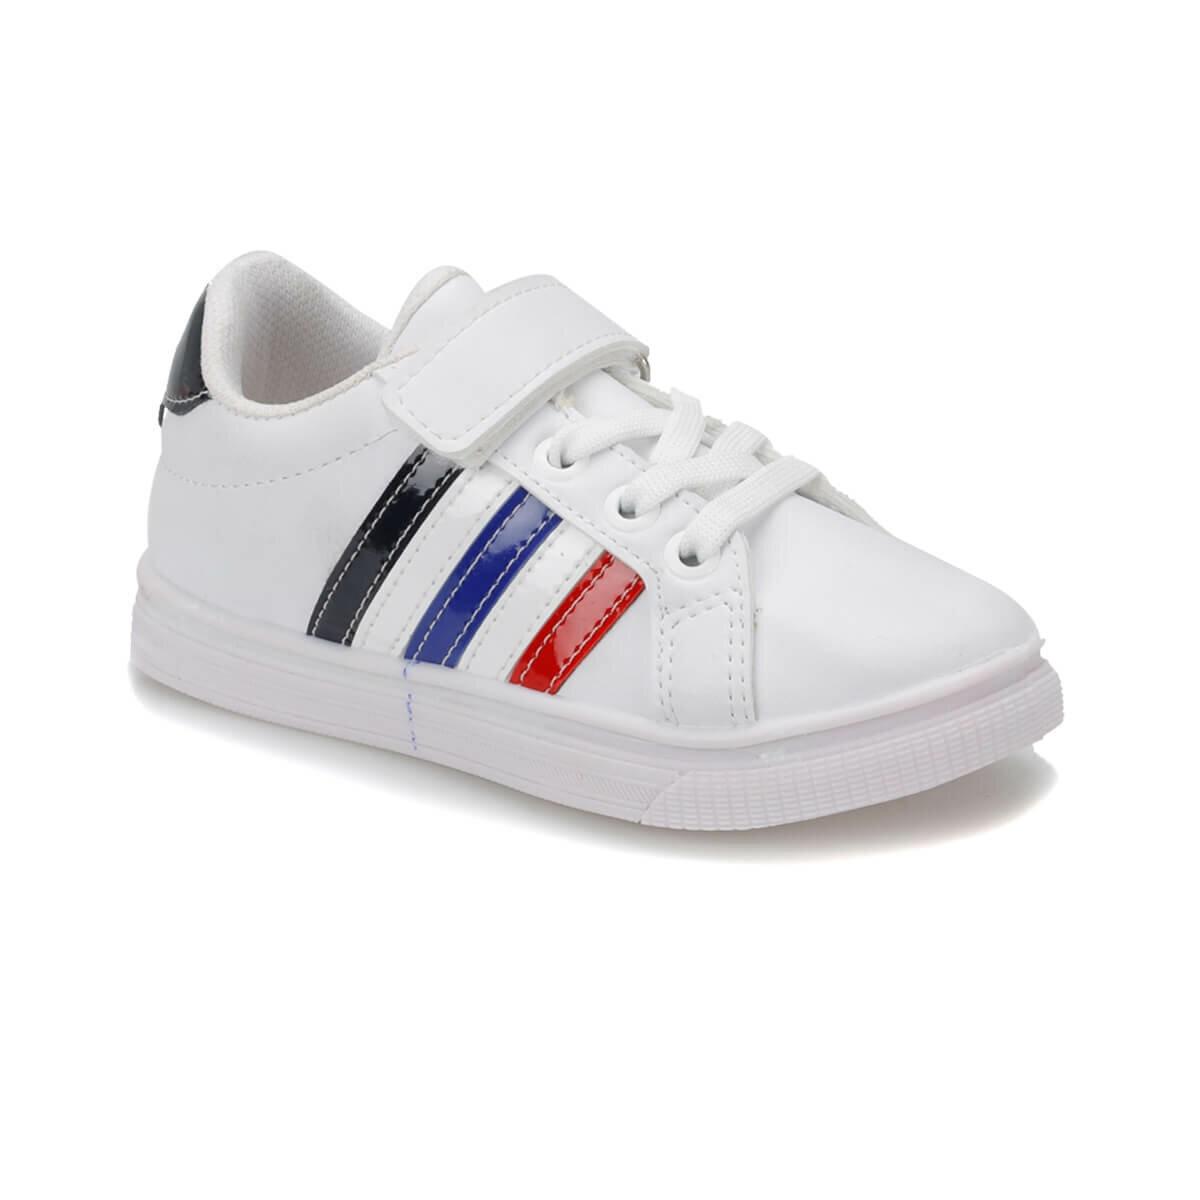 FLO DESMOND White Male Child Sneaker Shoes I-Cool